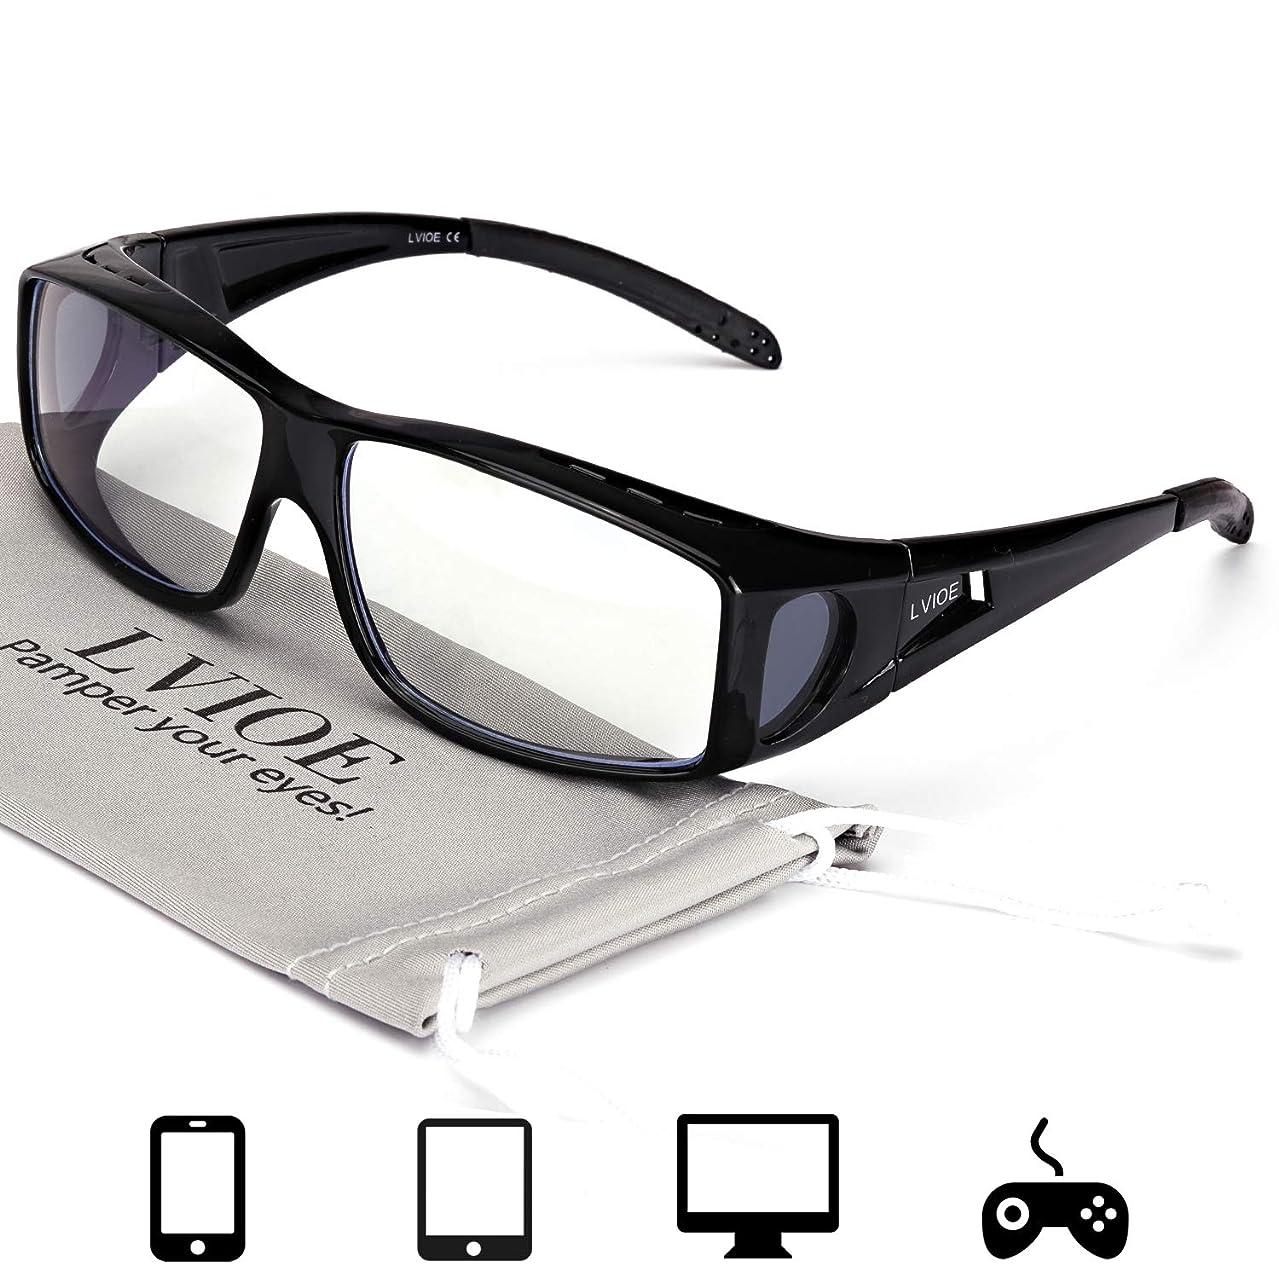 Fit Over Blue Light Blocking Glasses and Computer Eyewear - Wear Over Your Prescription Glasses/Reading Glasses/RX Glasses (Black Frame Anti Blue Light Glasses)